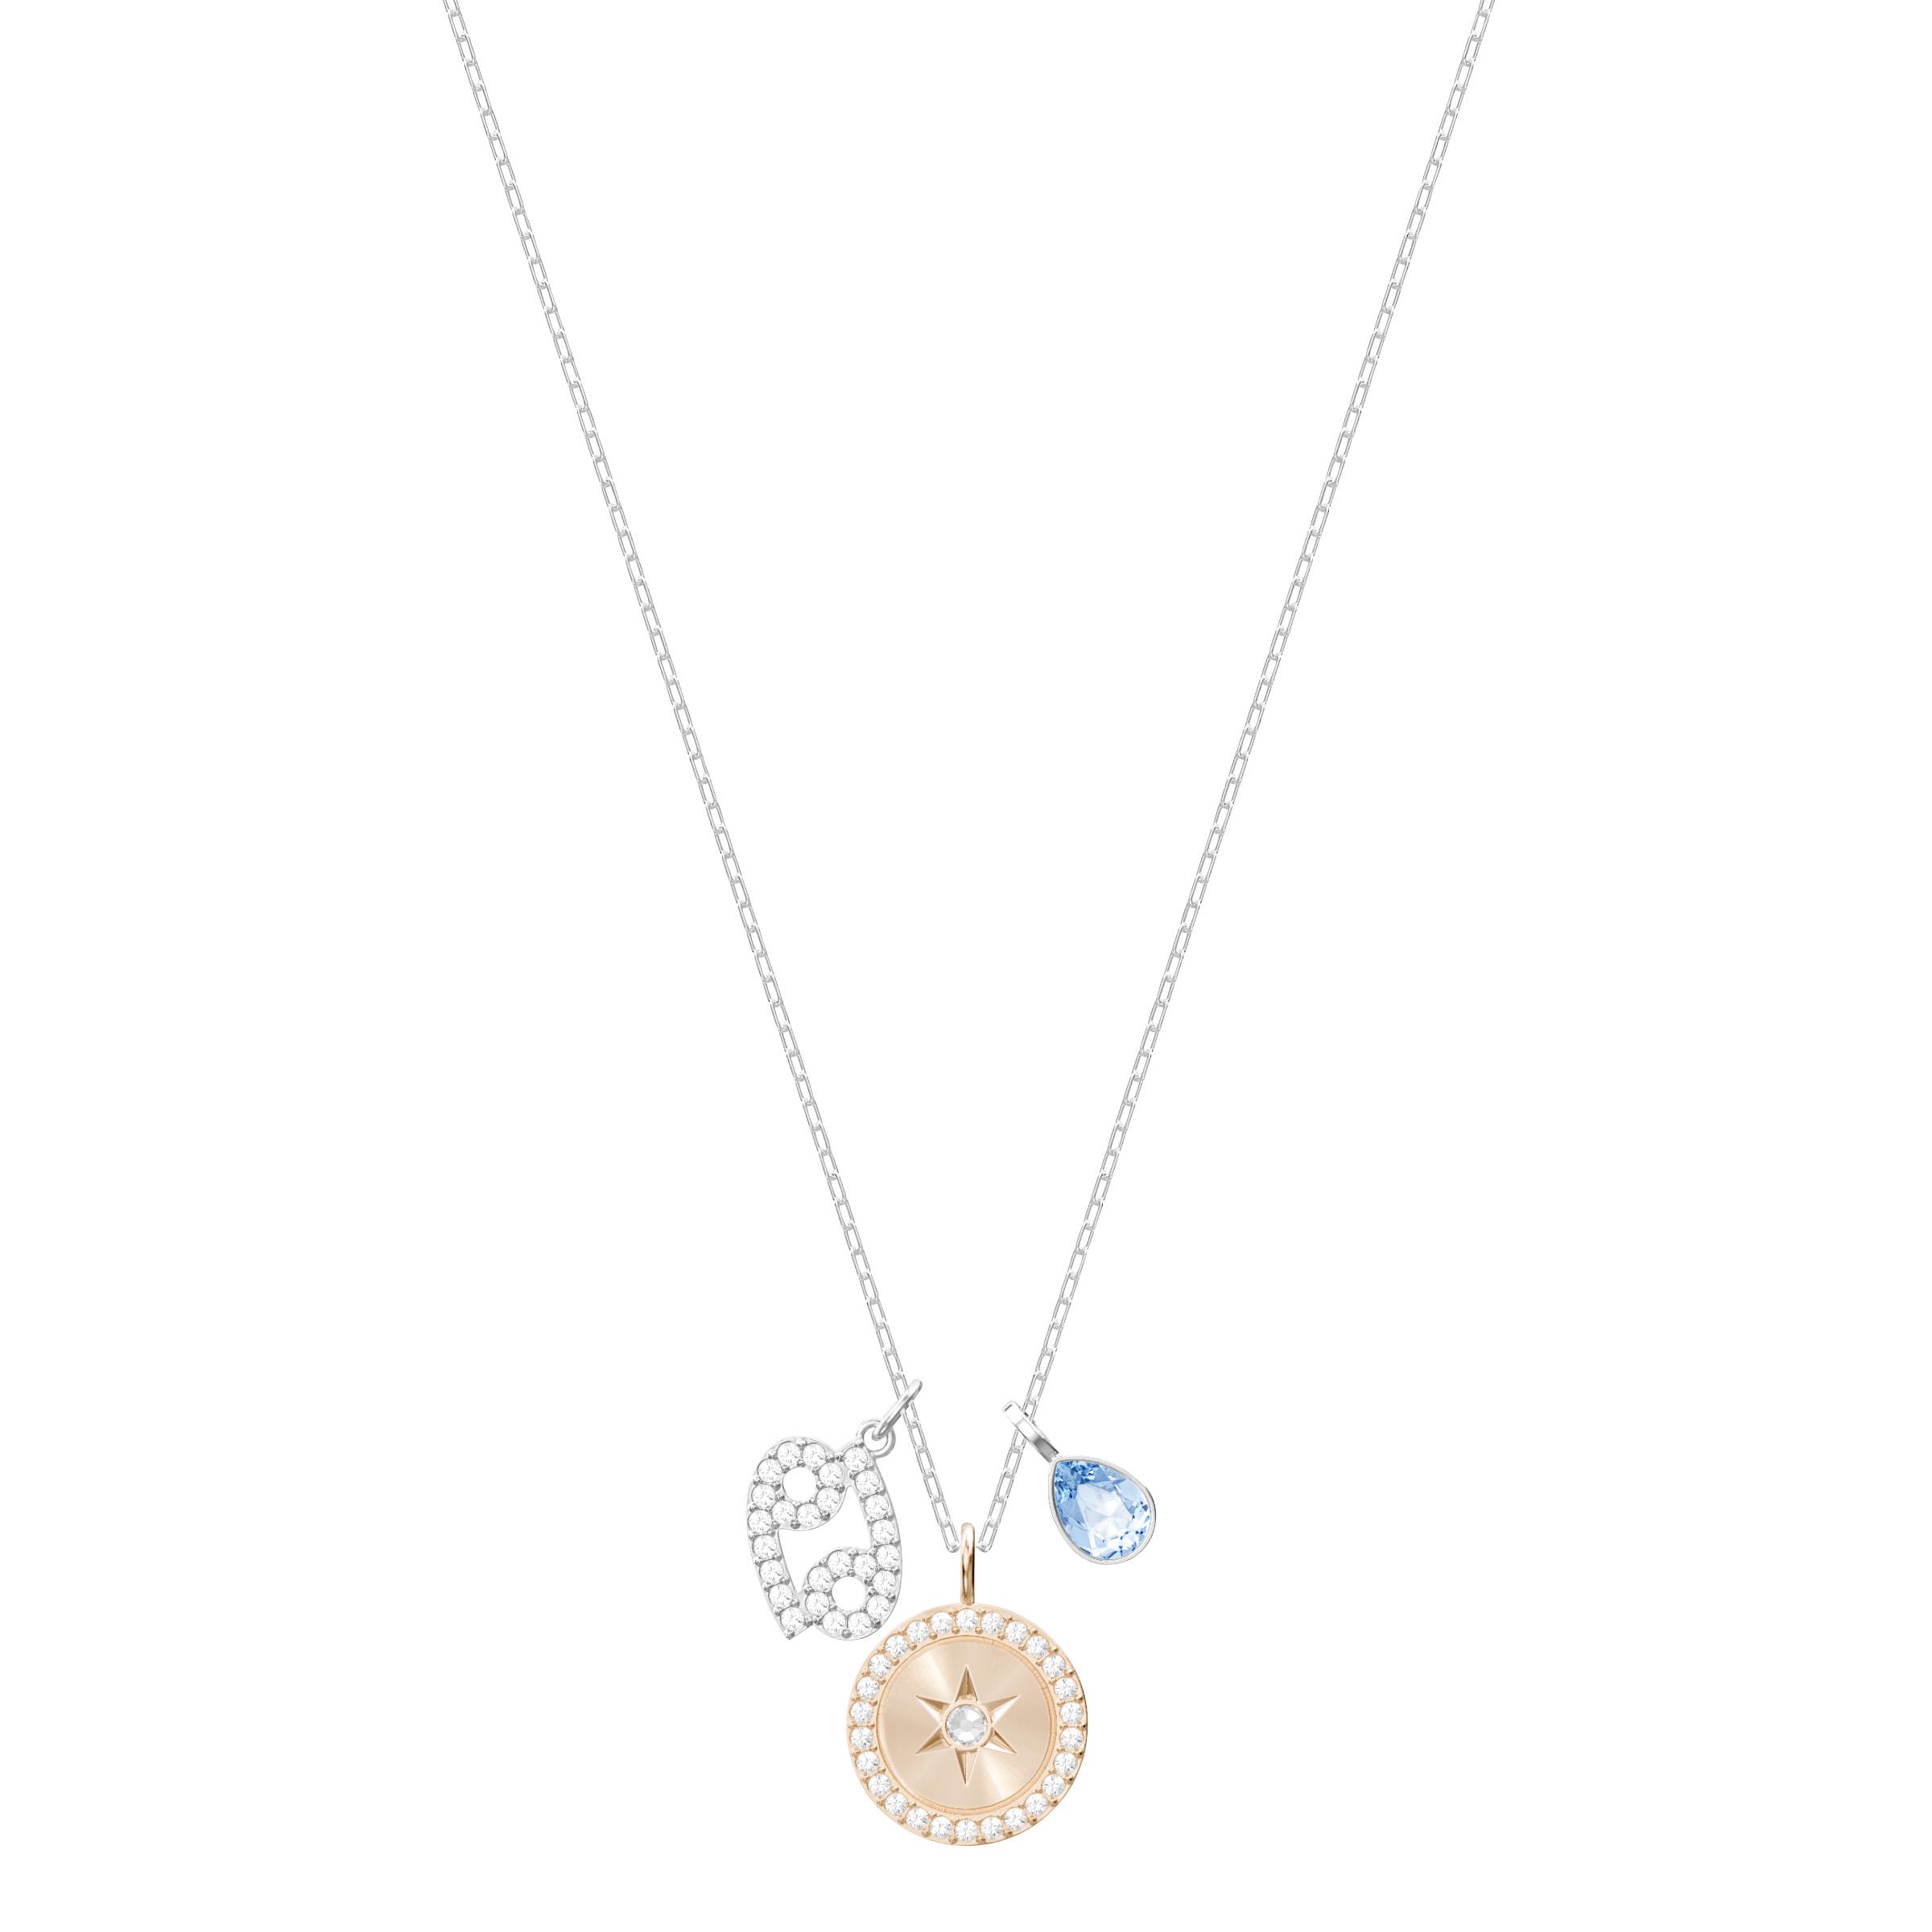 Pendentif Zodiac, Cancer, aiguemarine turquoise, Métal rhodié Swarovski